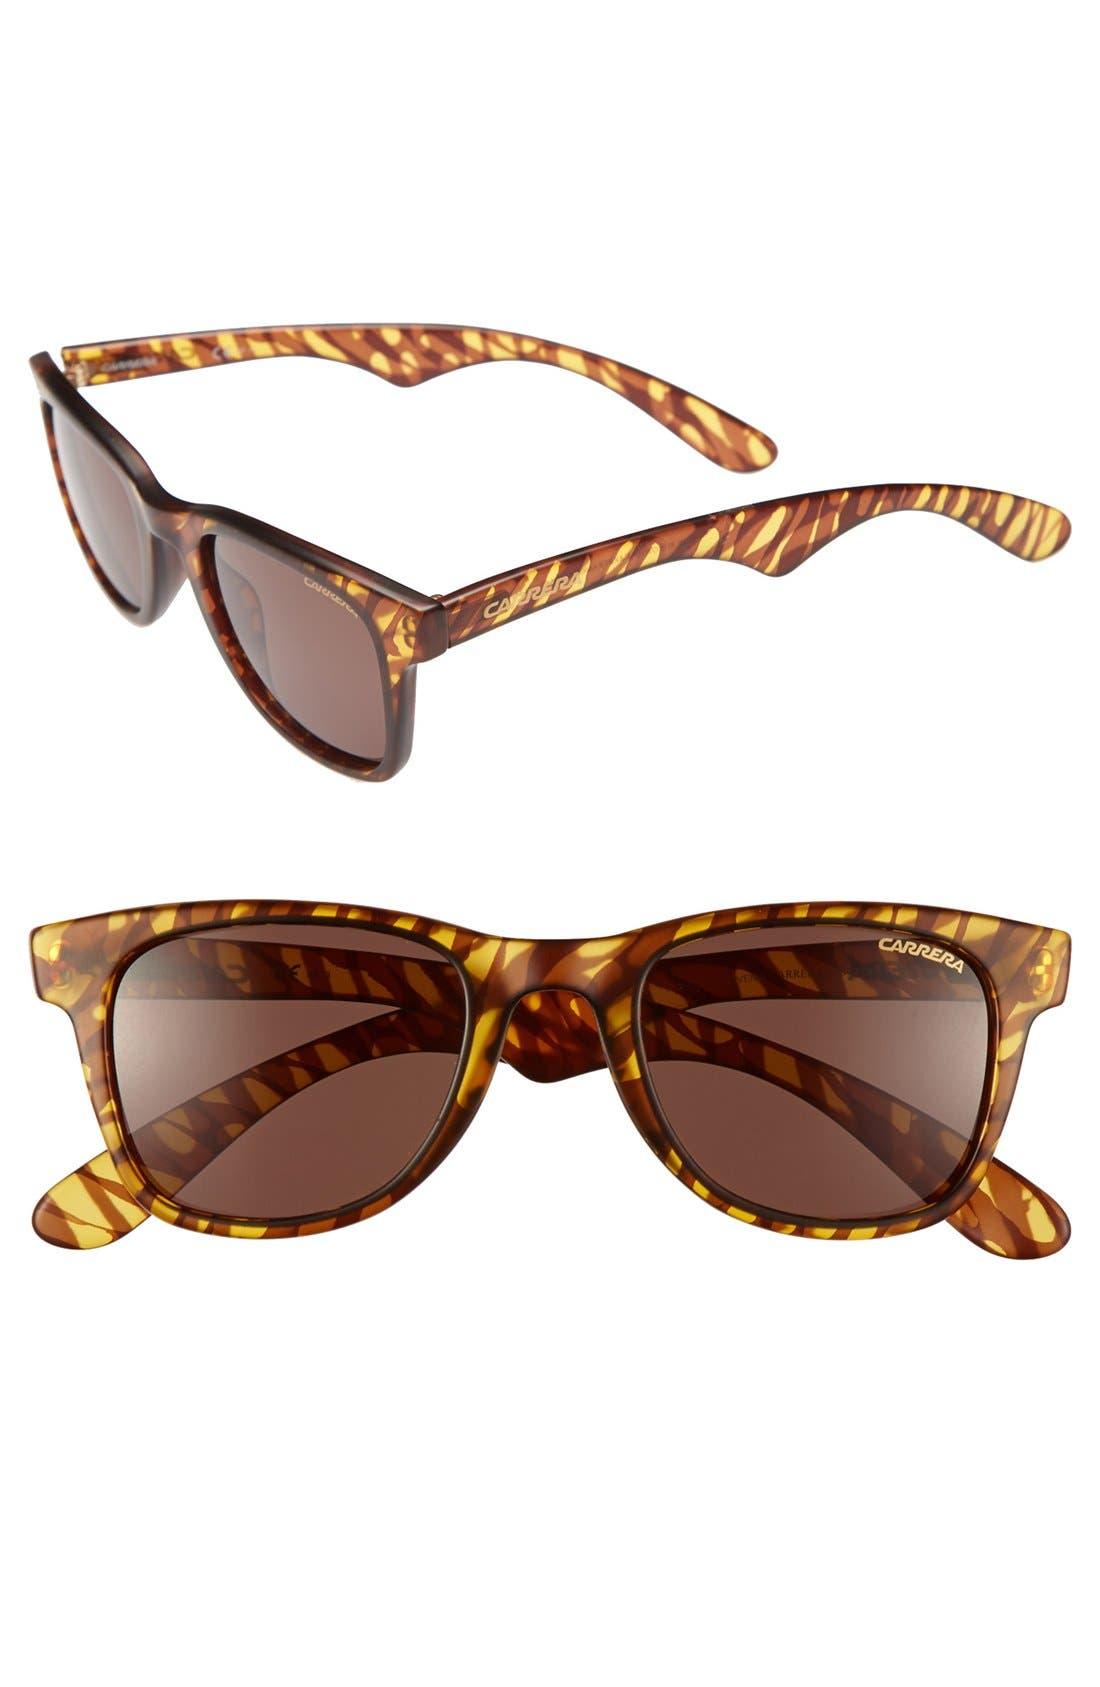 Alternate Image 1 Selected - Carrera Eyewear 50mm Sunglasses